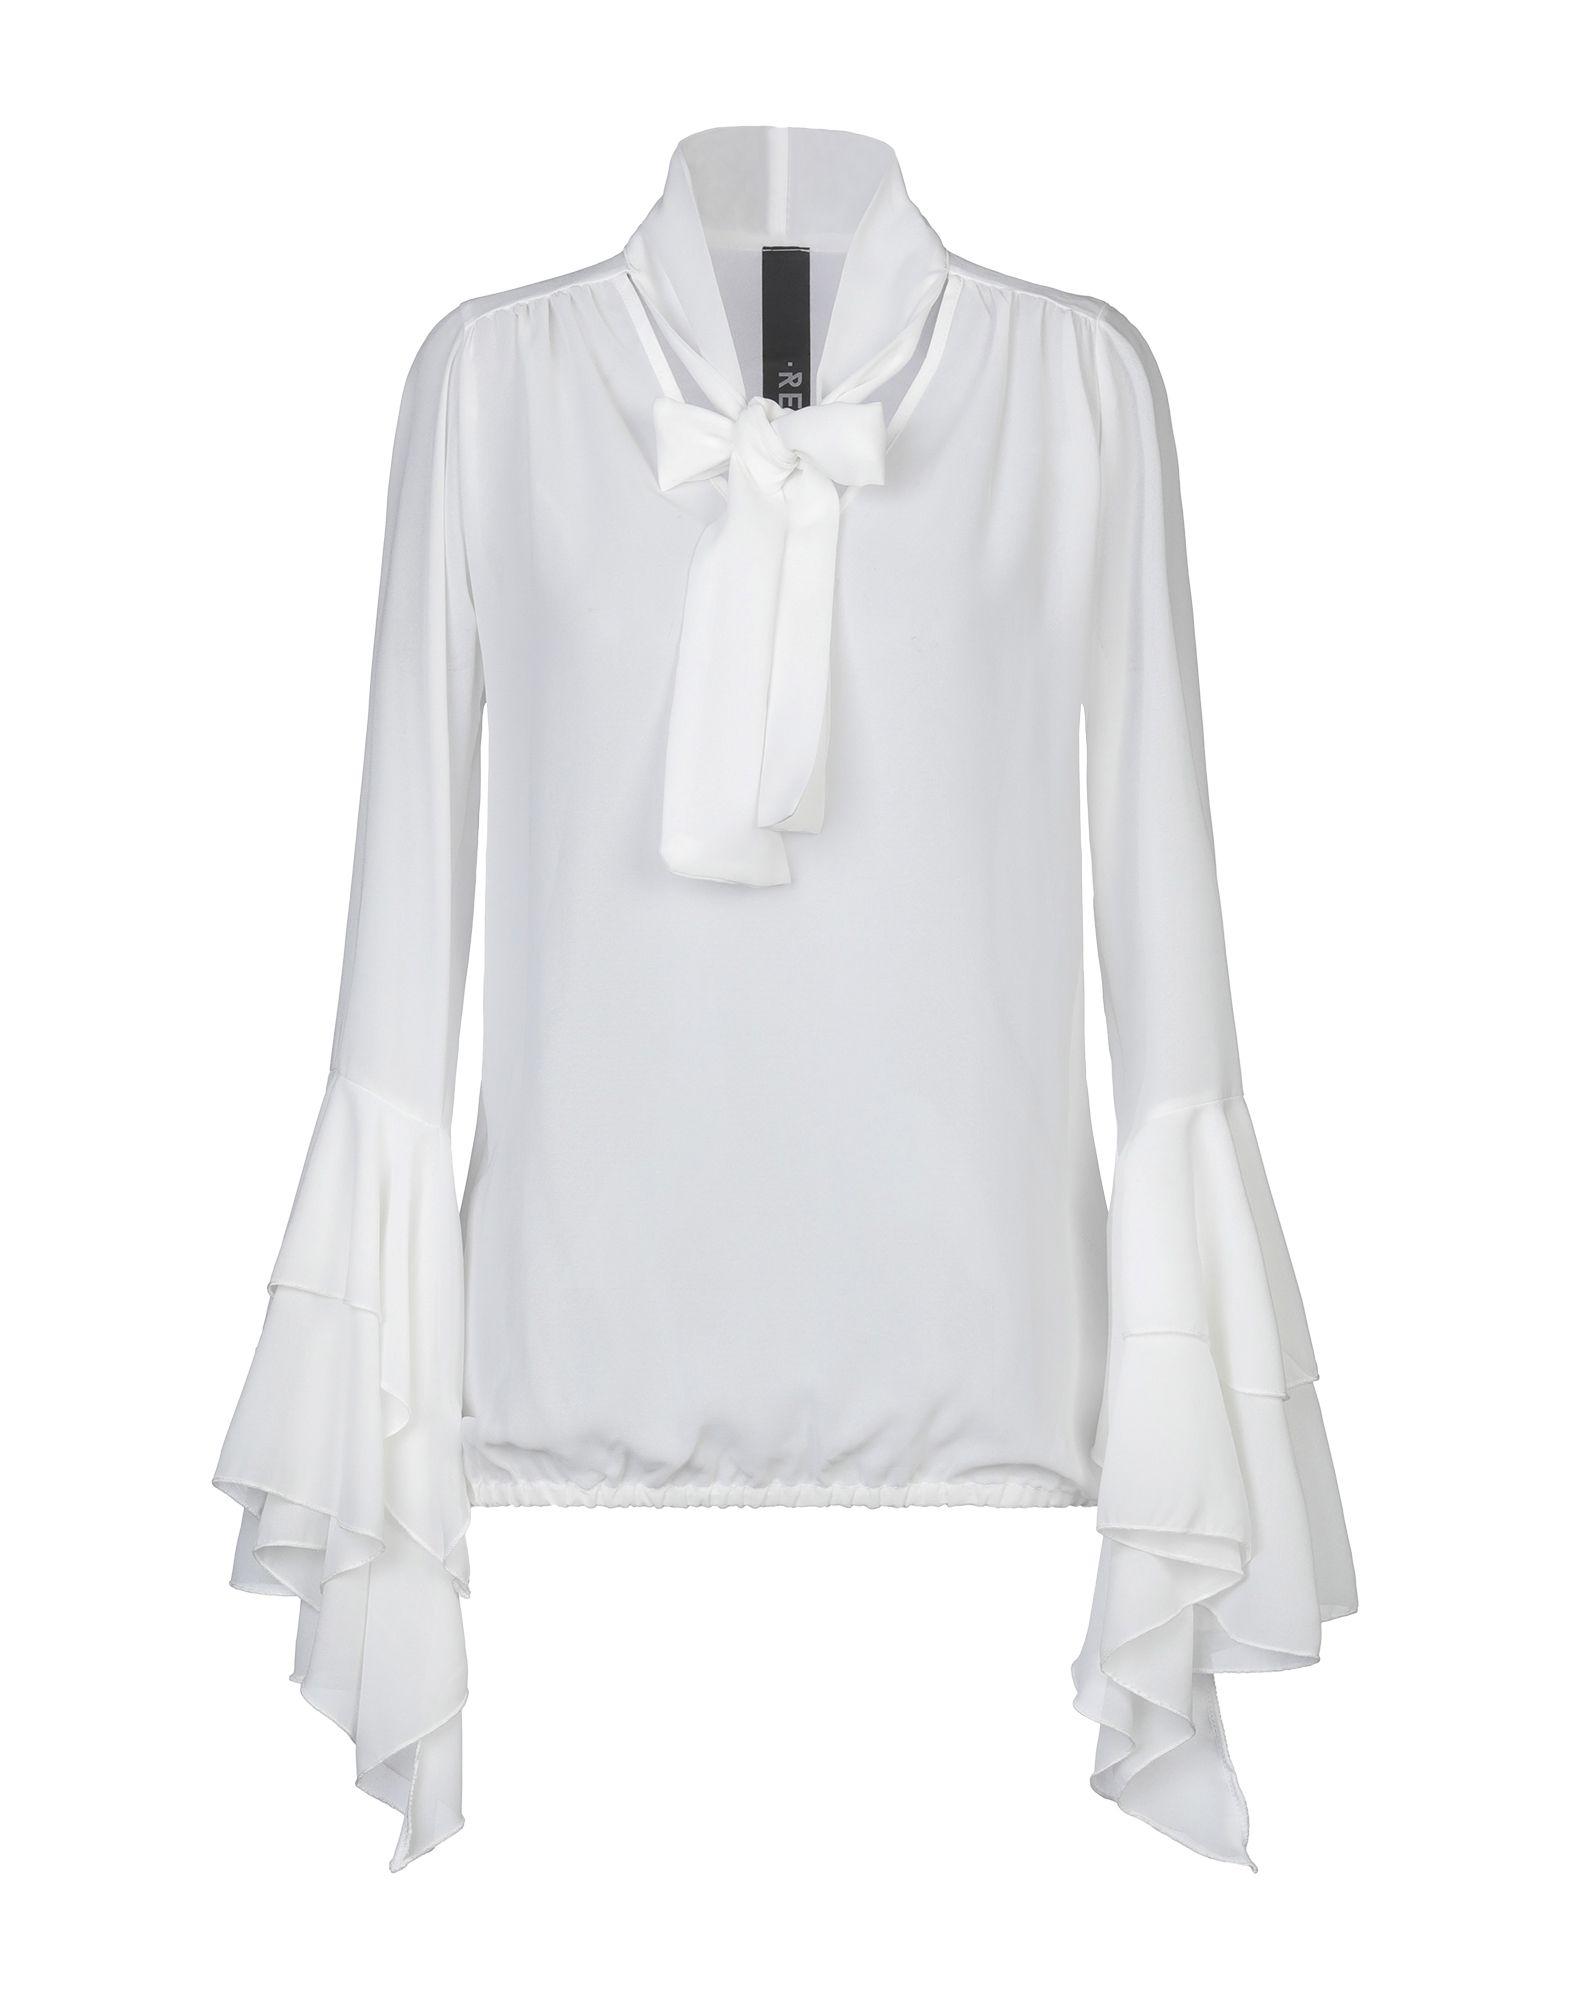 Фото - REVISE Блузка revise футболка